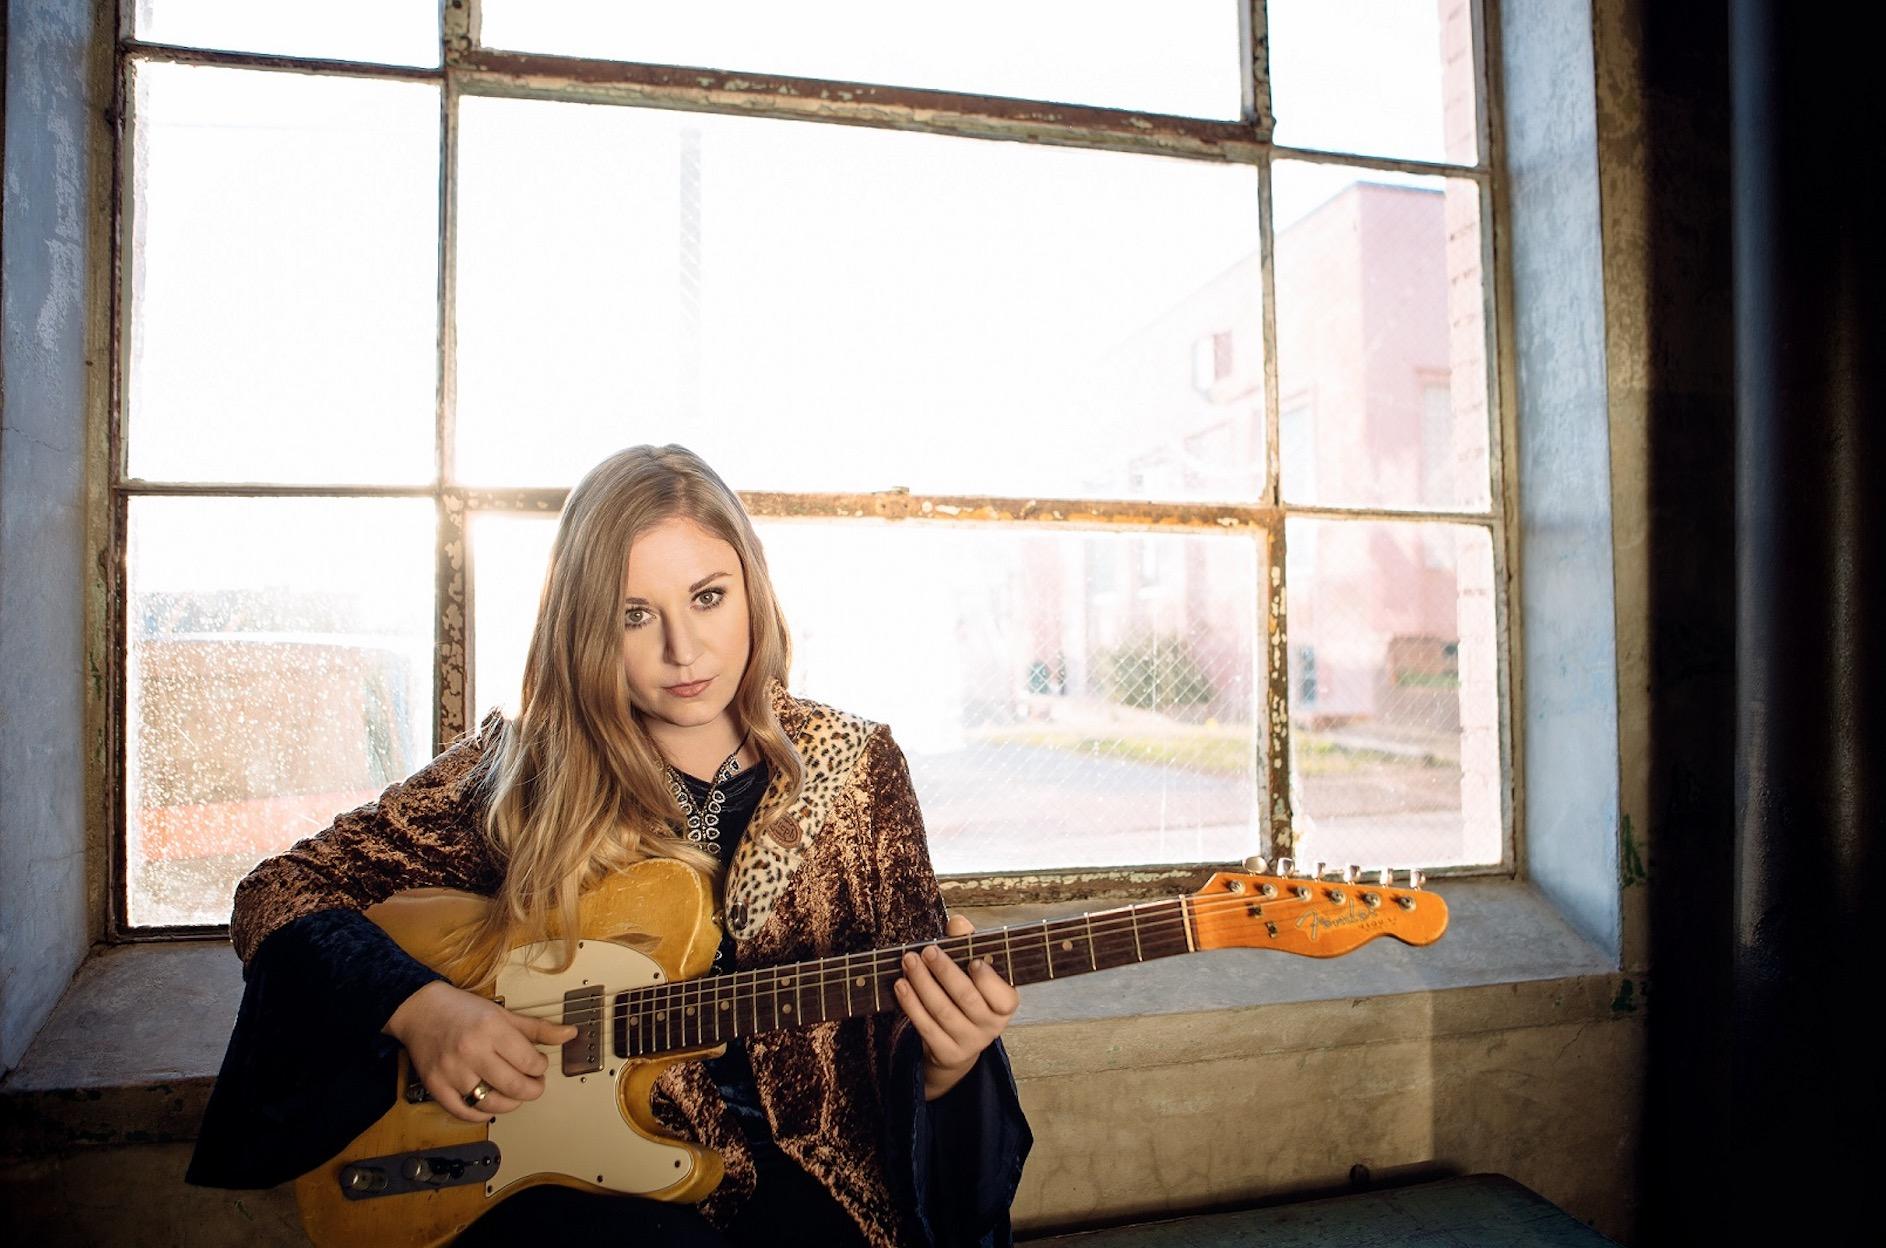 INTERVIEW: Joanne Shaw Taylor talks new album 'Reckless Heart'